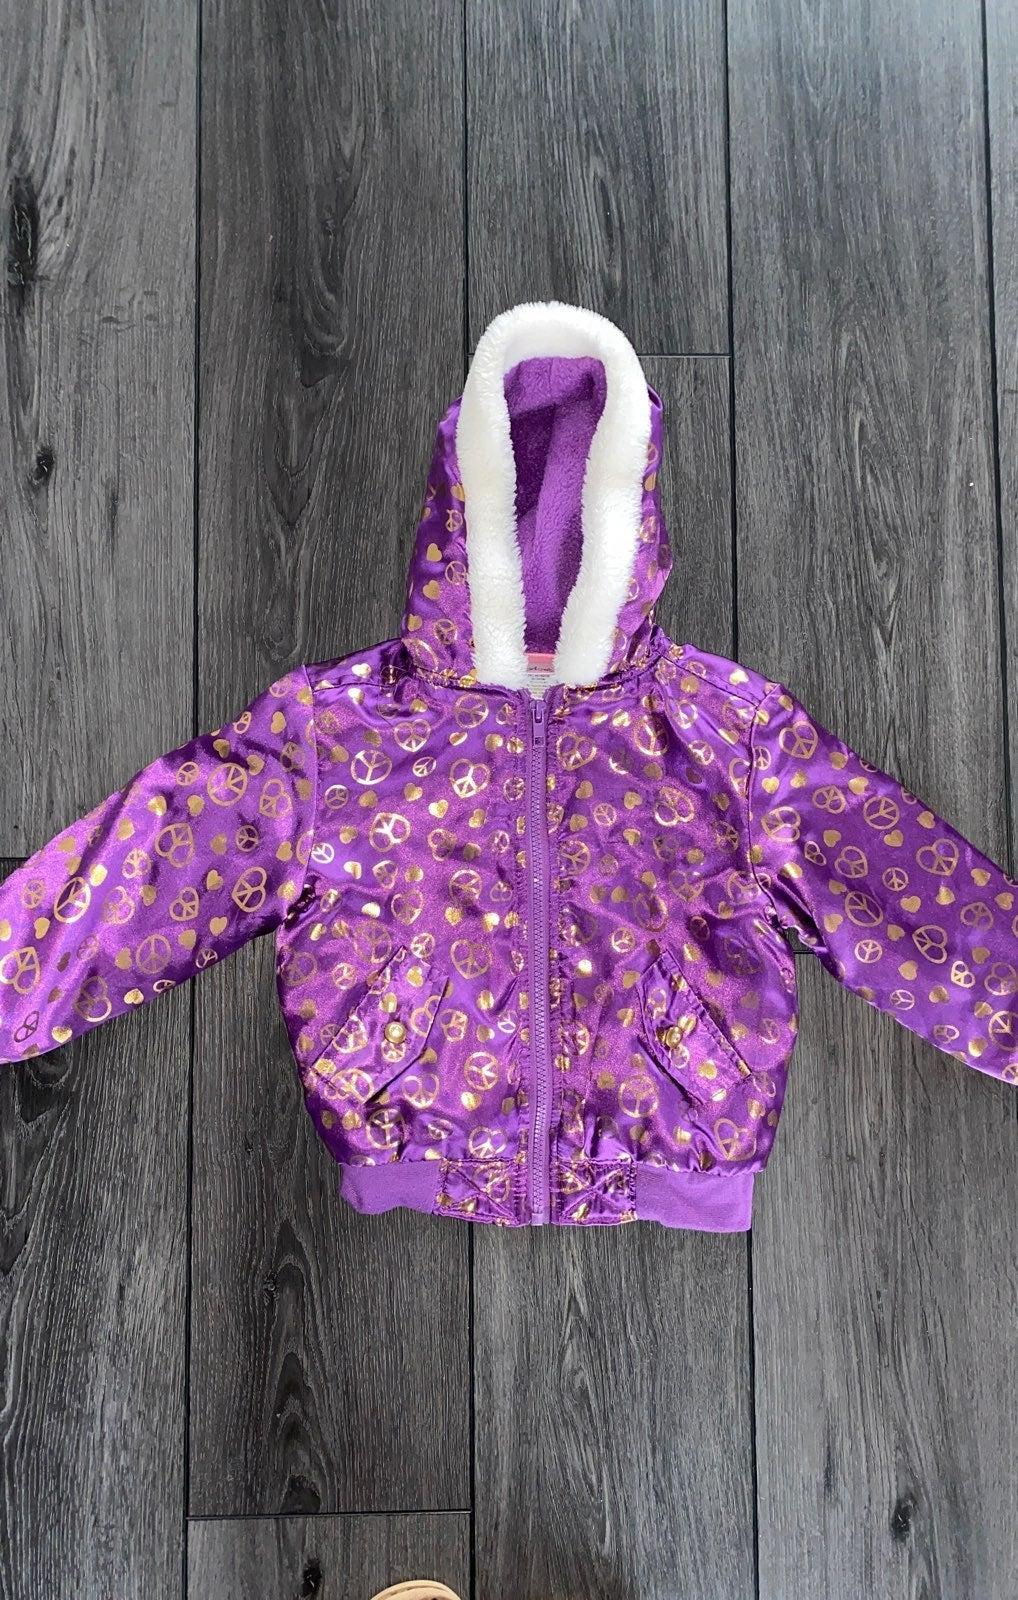 4T purple fleece lined jacket with hood